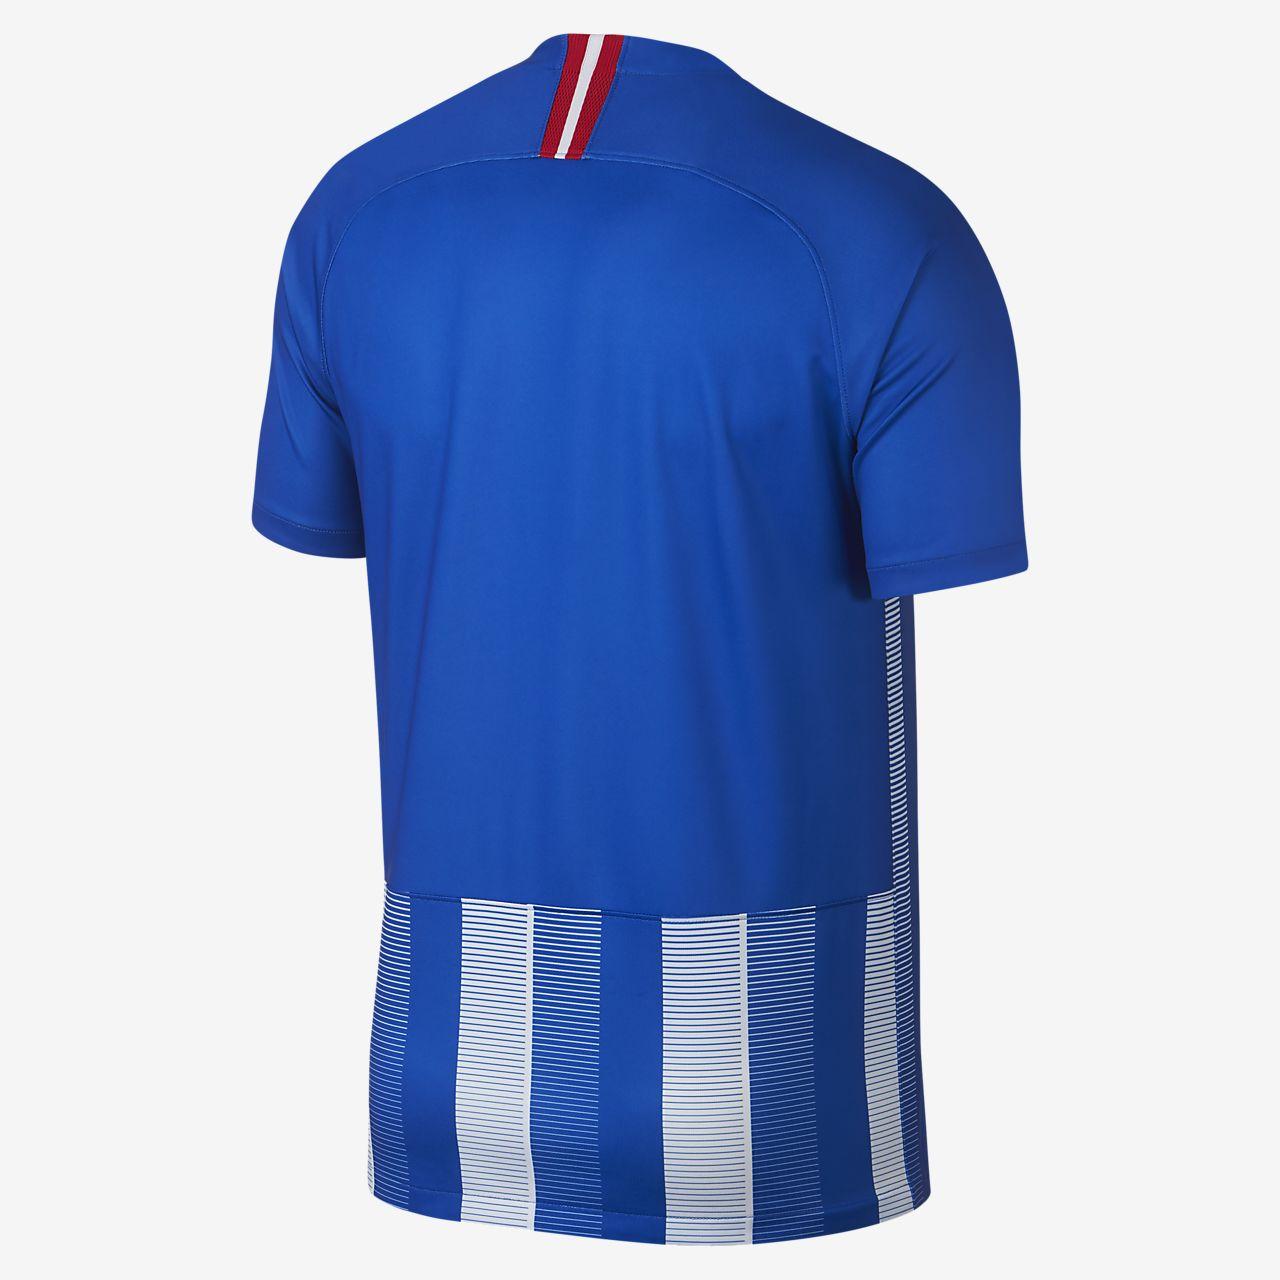 Camiseta de fútbol para hombre 2018 19 Hertha BSC Stadium. Nike.com MX 5b50dfc758c